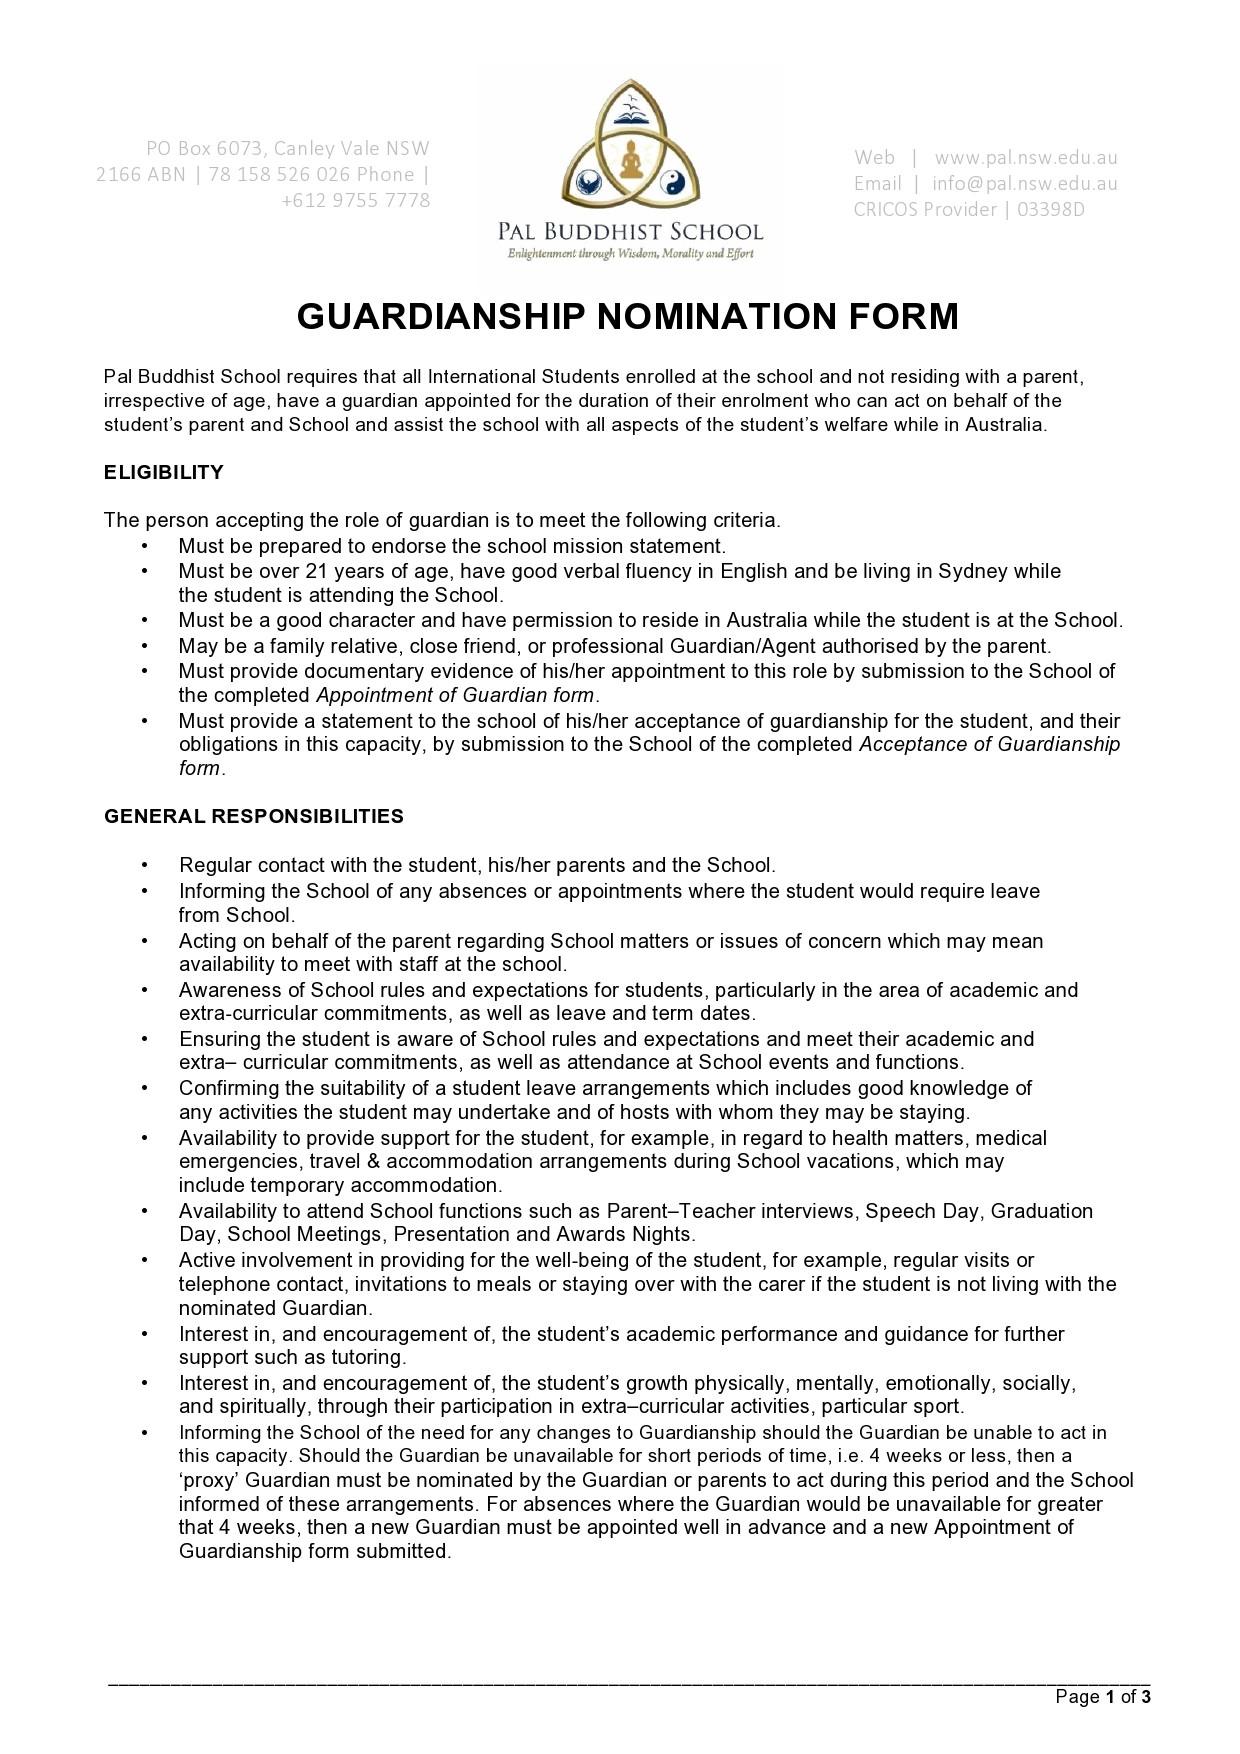 Free guardianship form 45